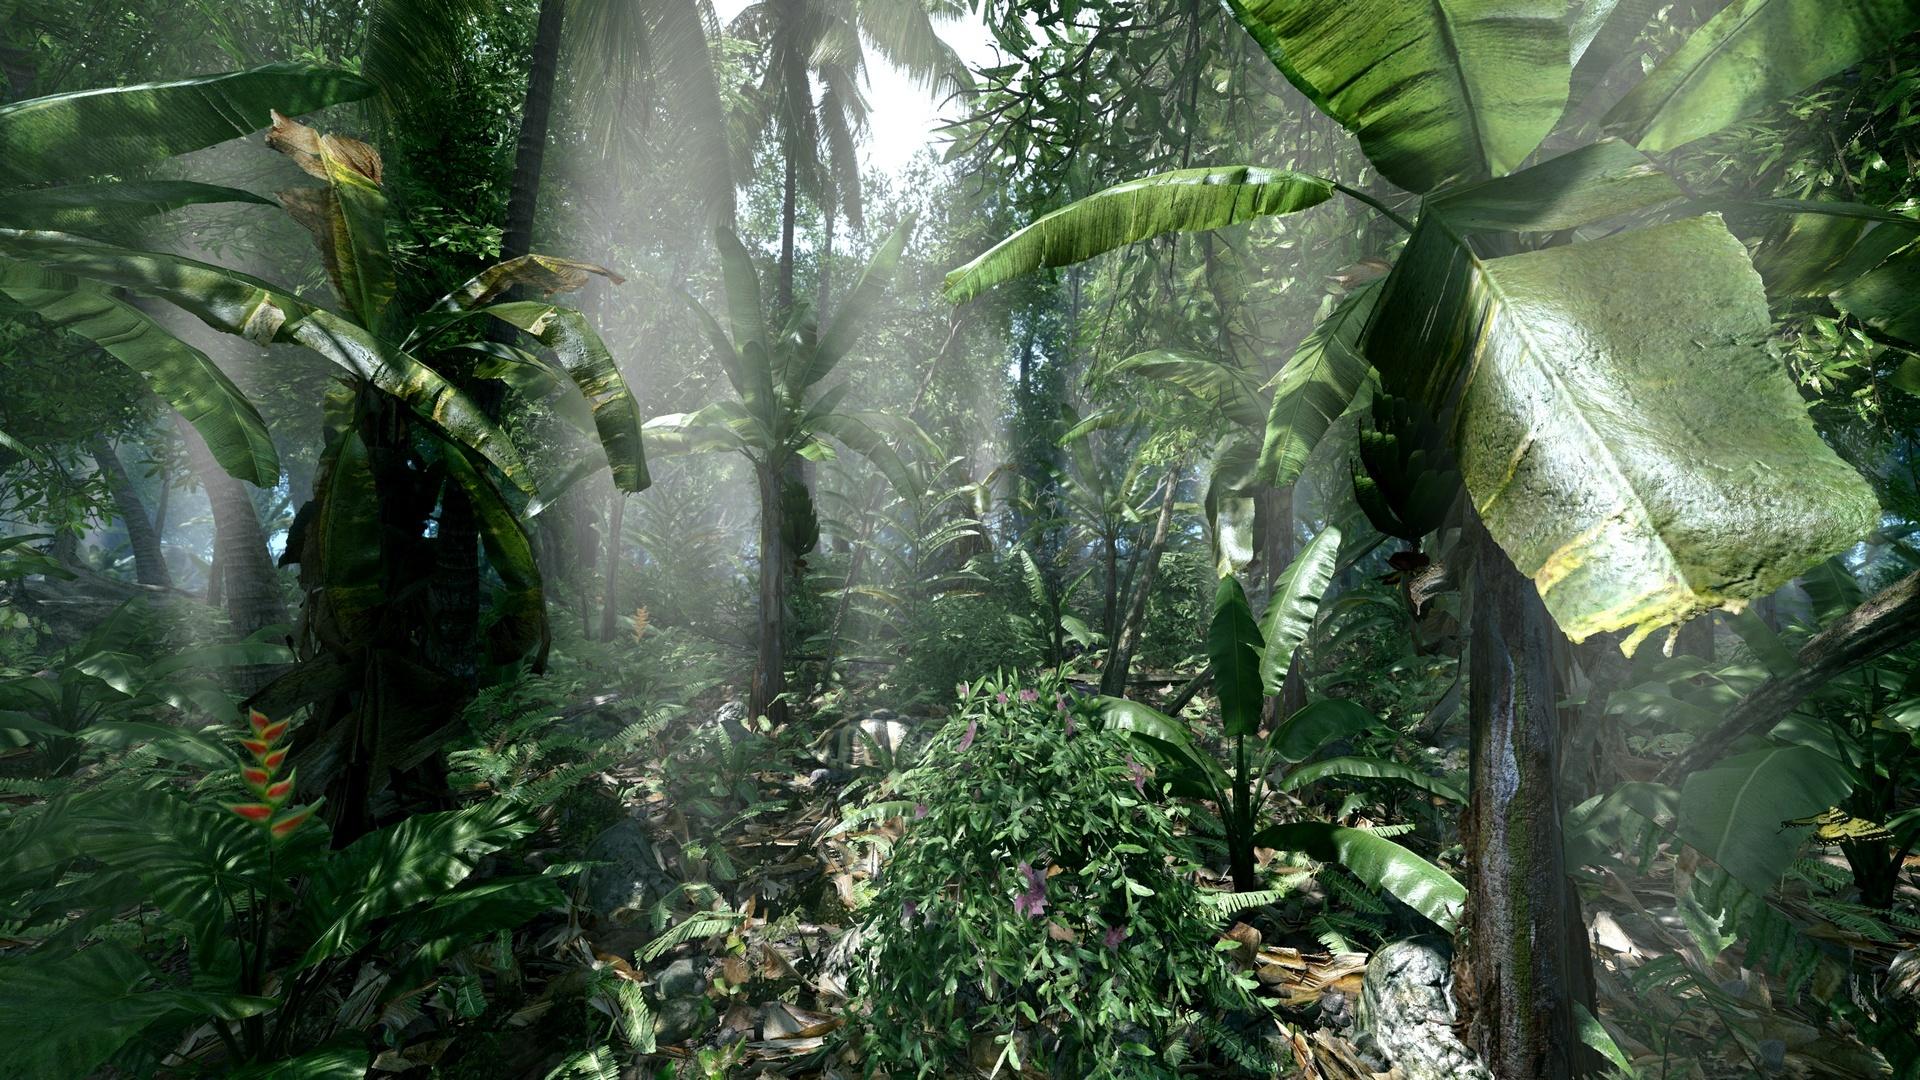 Jungle Wallpaper Desktop: Jungle Background